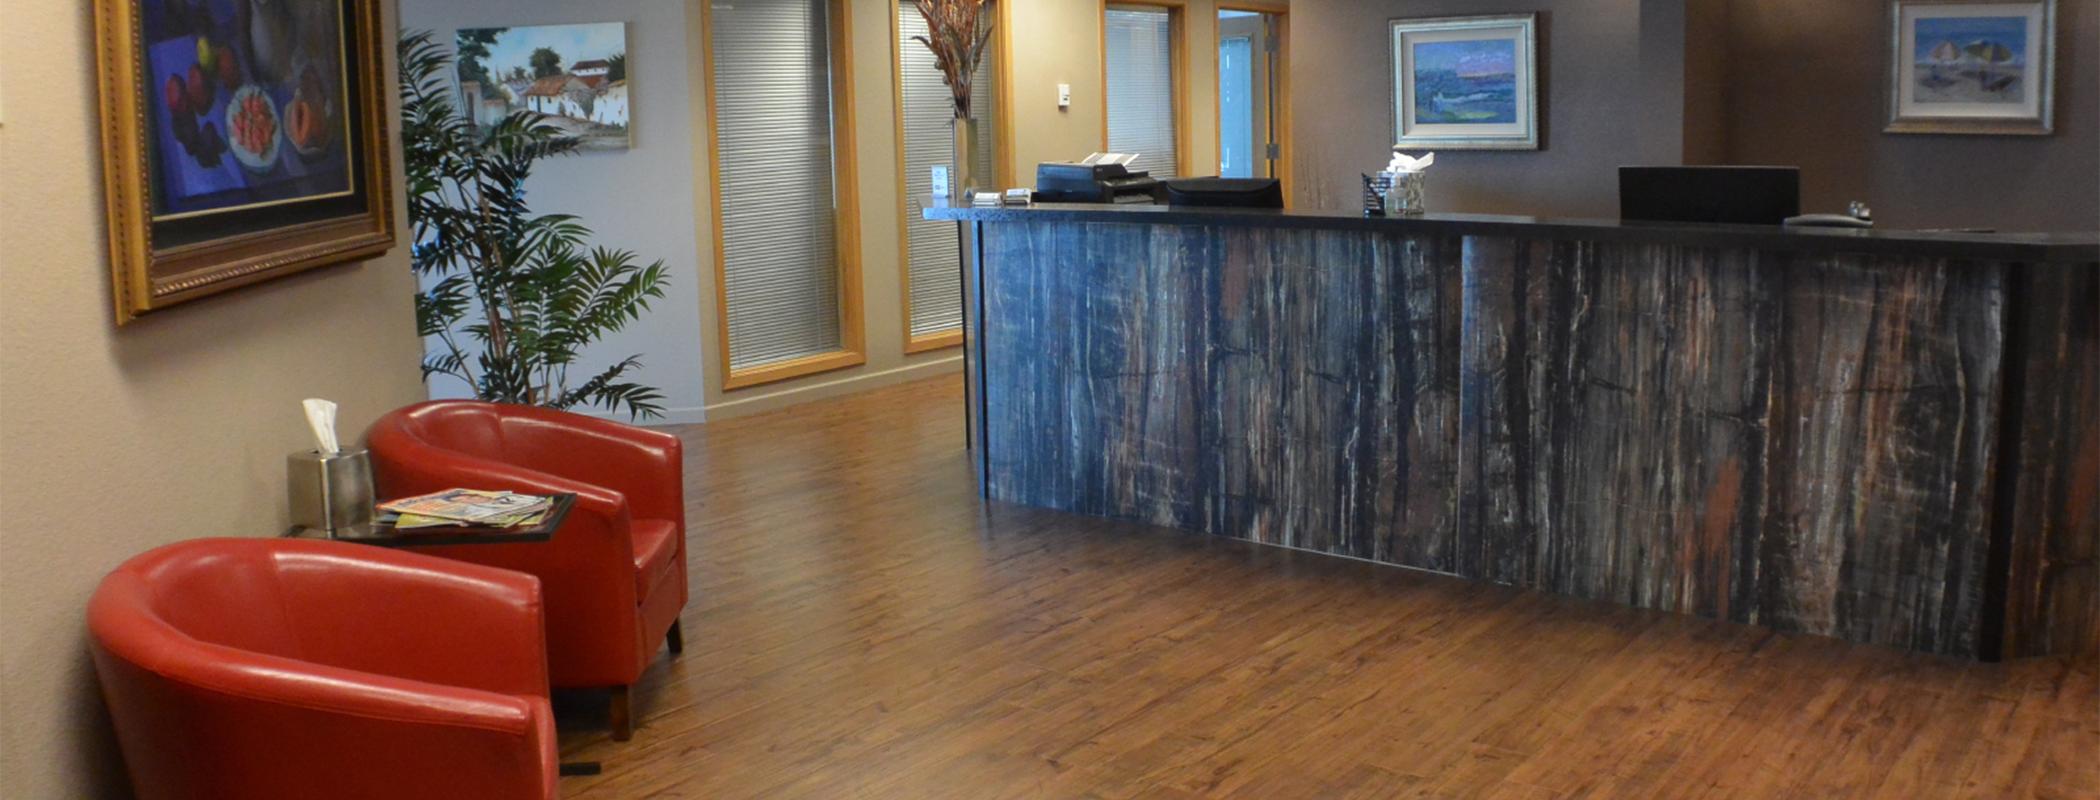 Colorado Restore Health Center